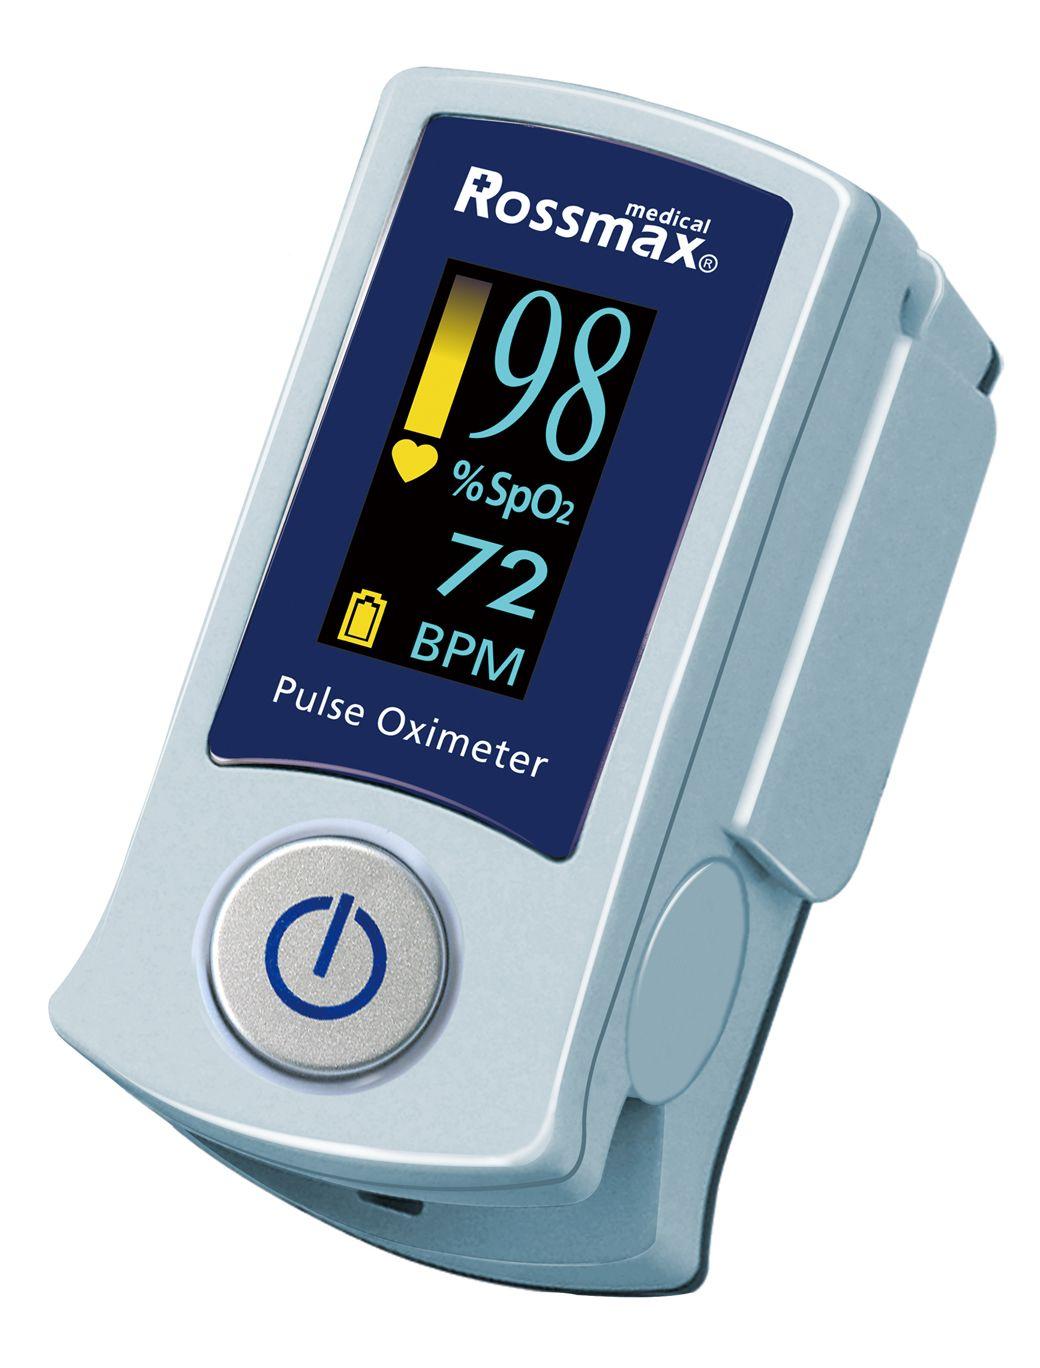 Rossmax Sb220 Vascular Vein Vein Health Health Check